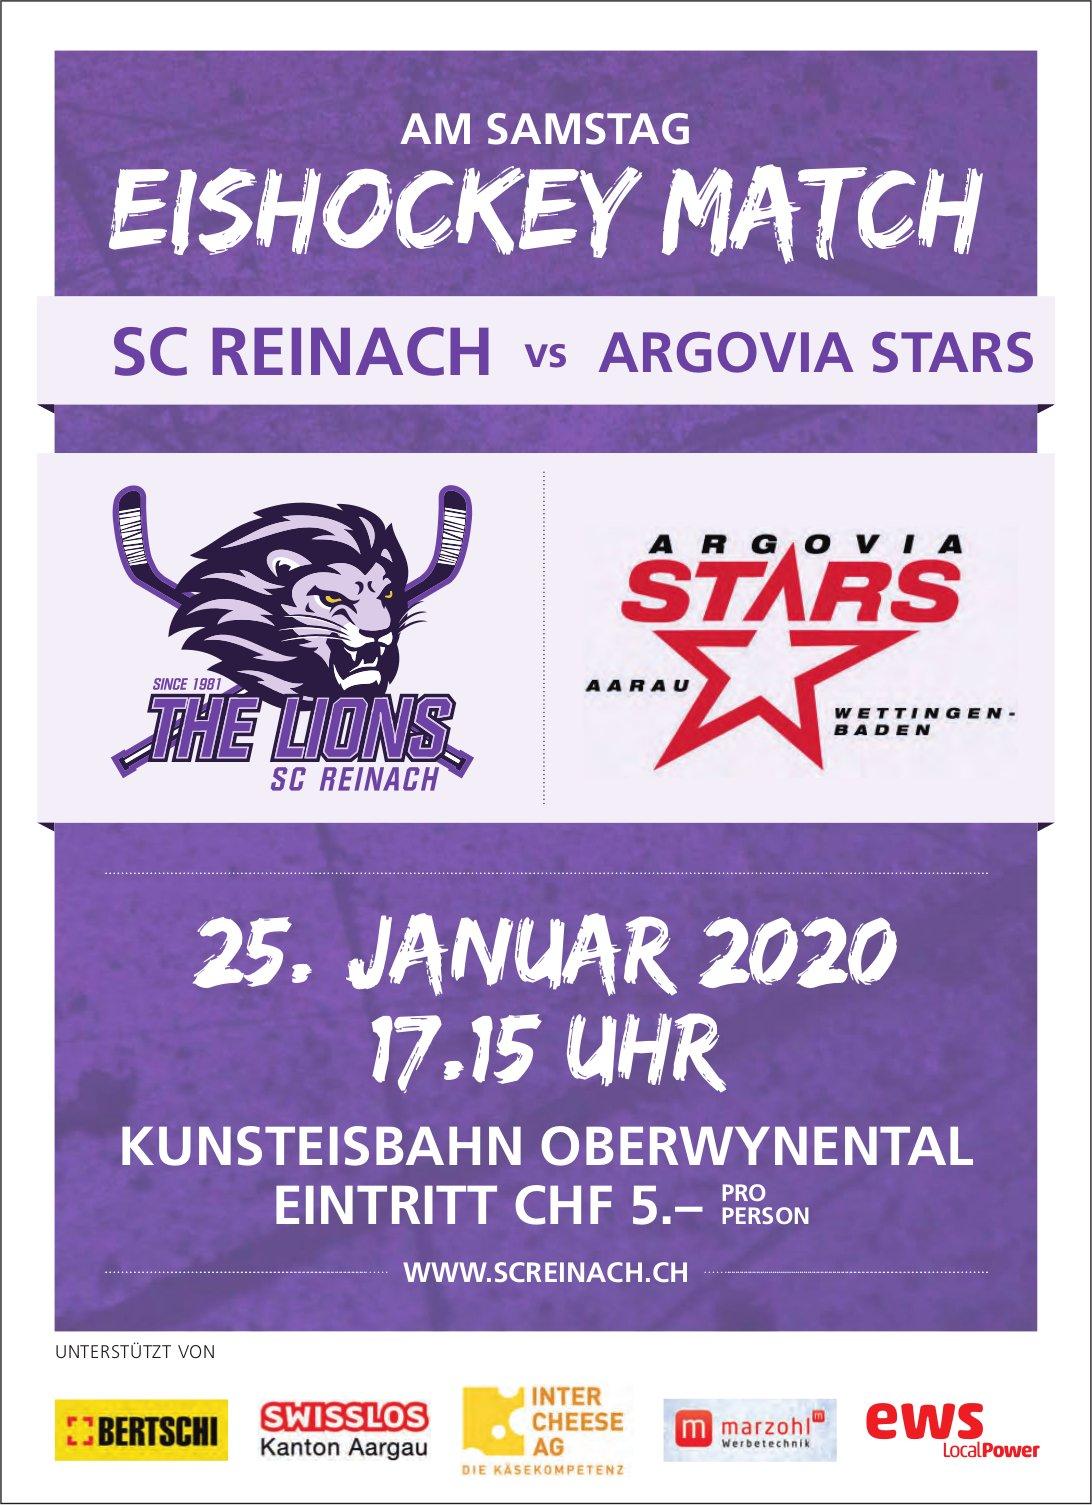 SC REINACH vs. ARGOVIA STARS, 25. Januar, KUNSTEISBAHN OBERWYNENTAL